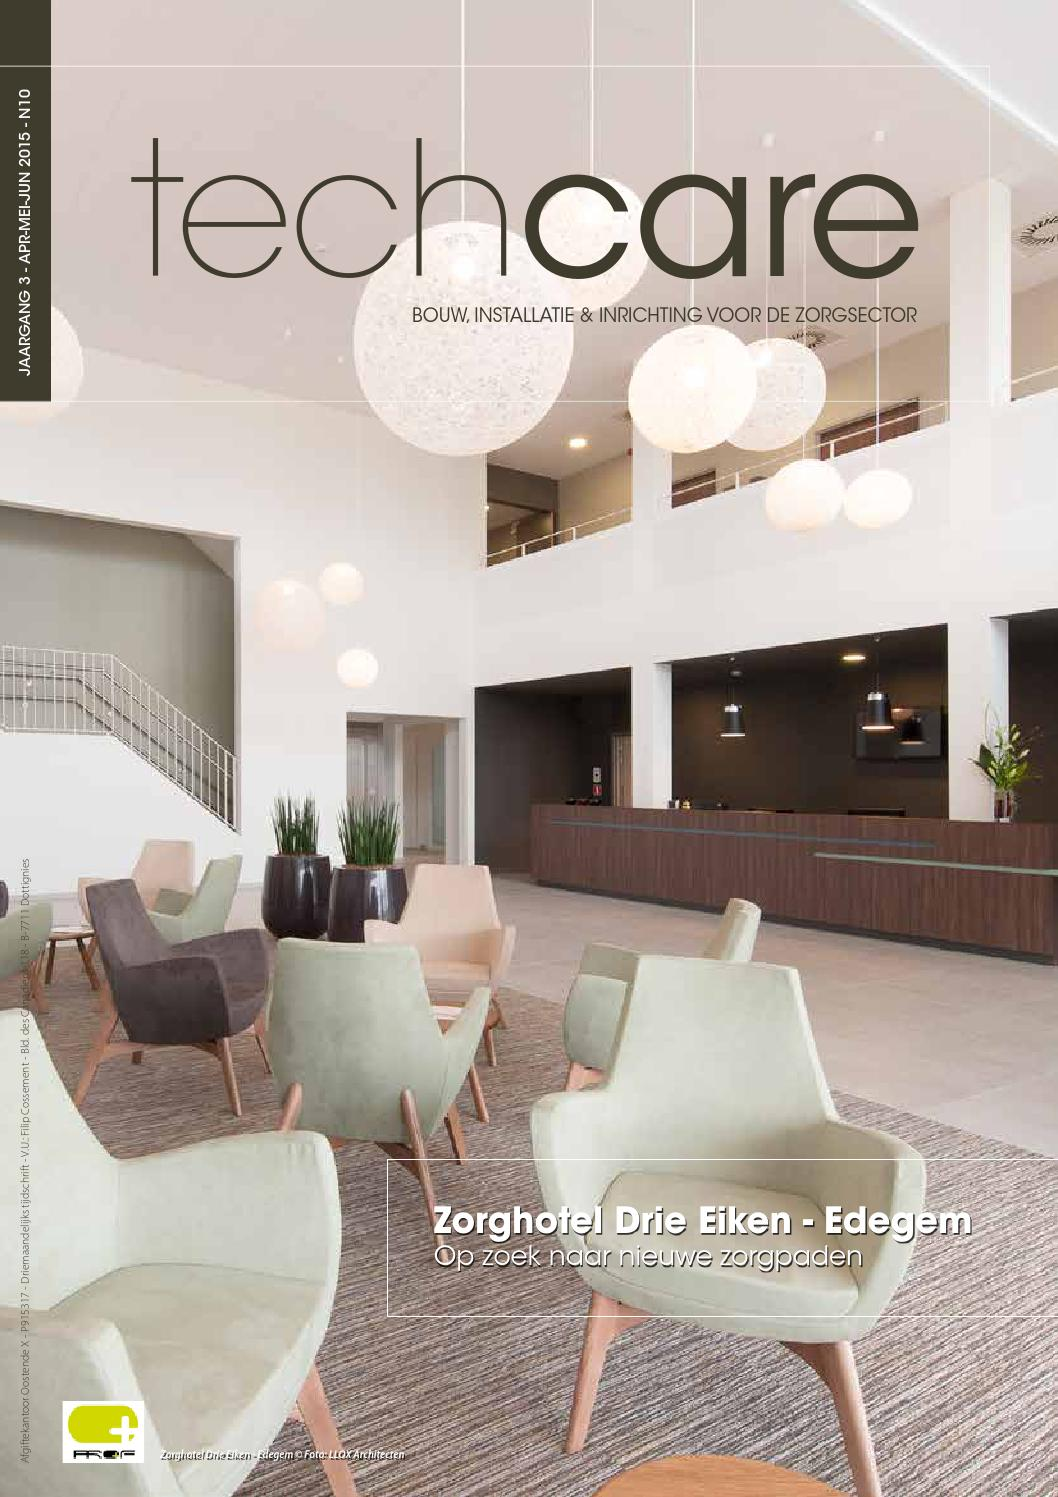 Techcare 09 nl by techcare magazine   issuu